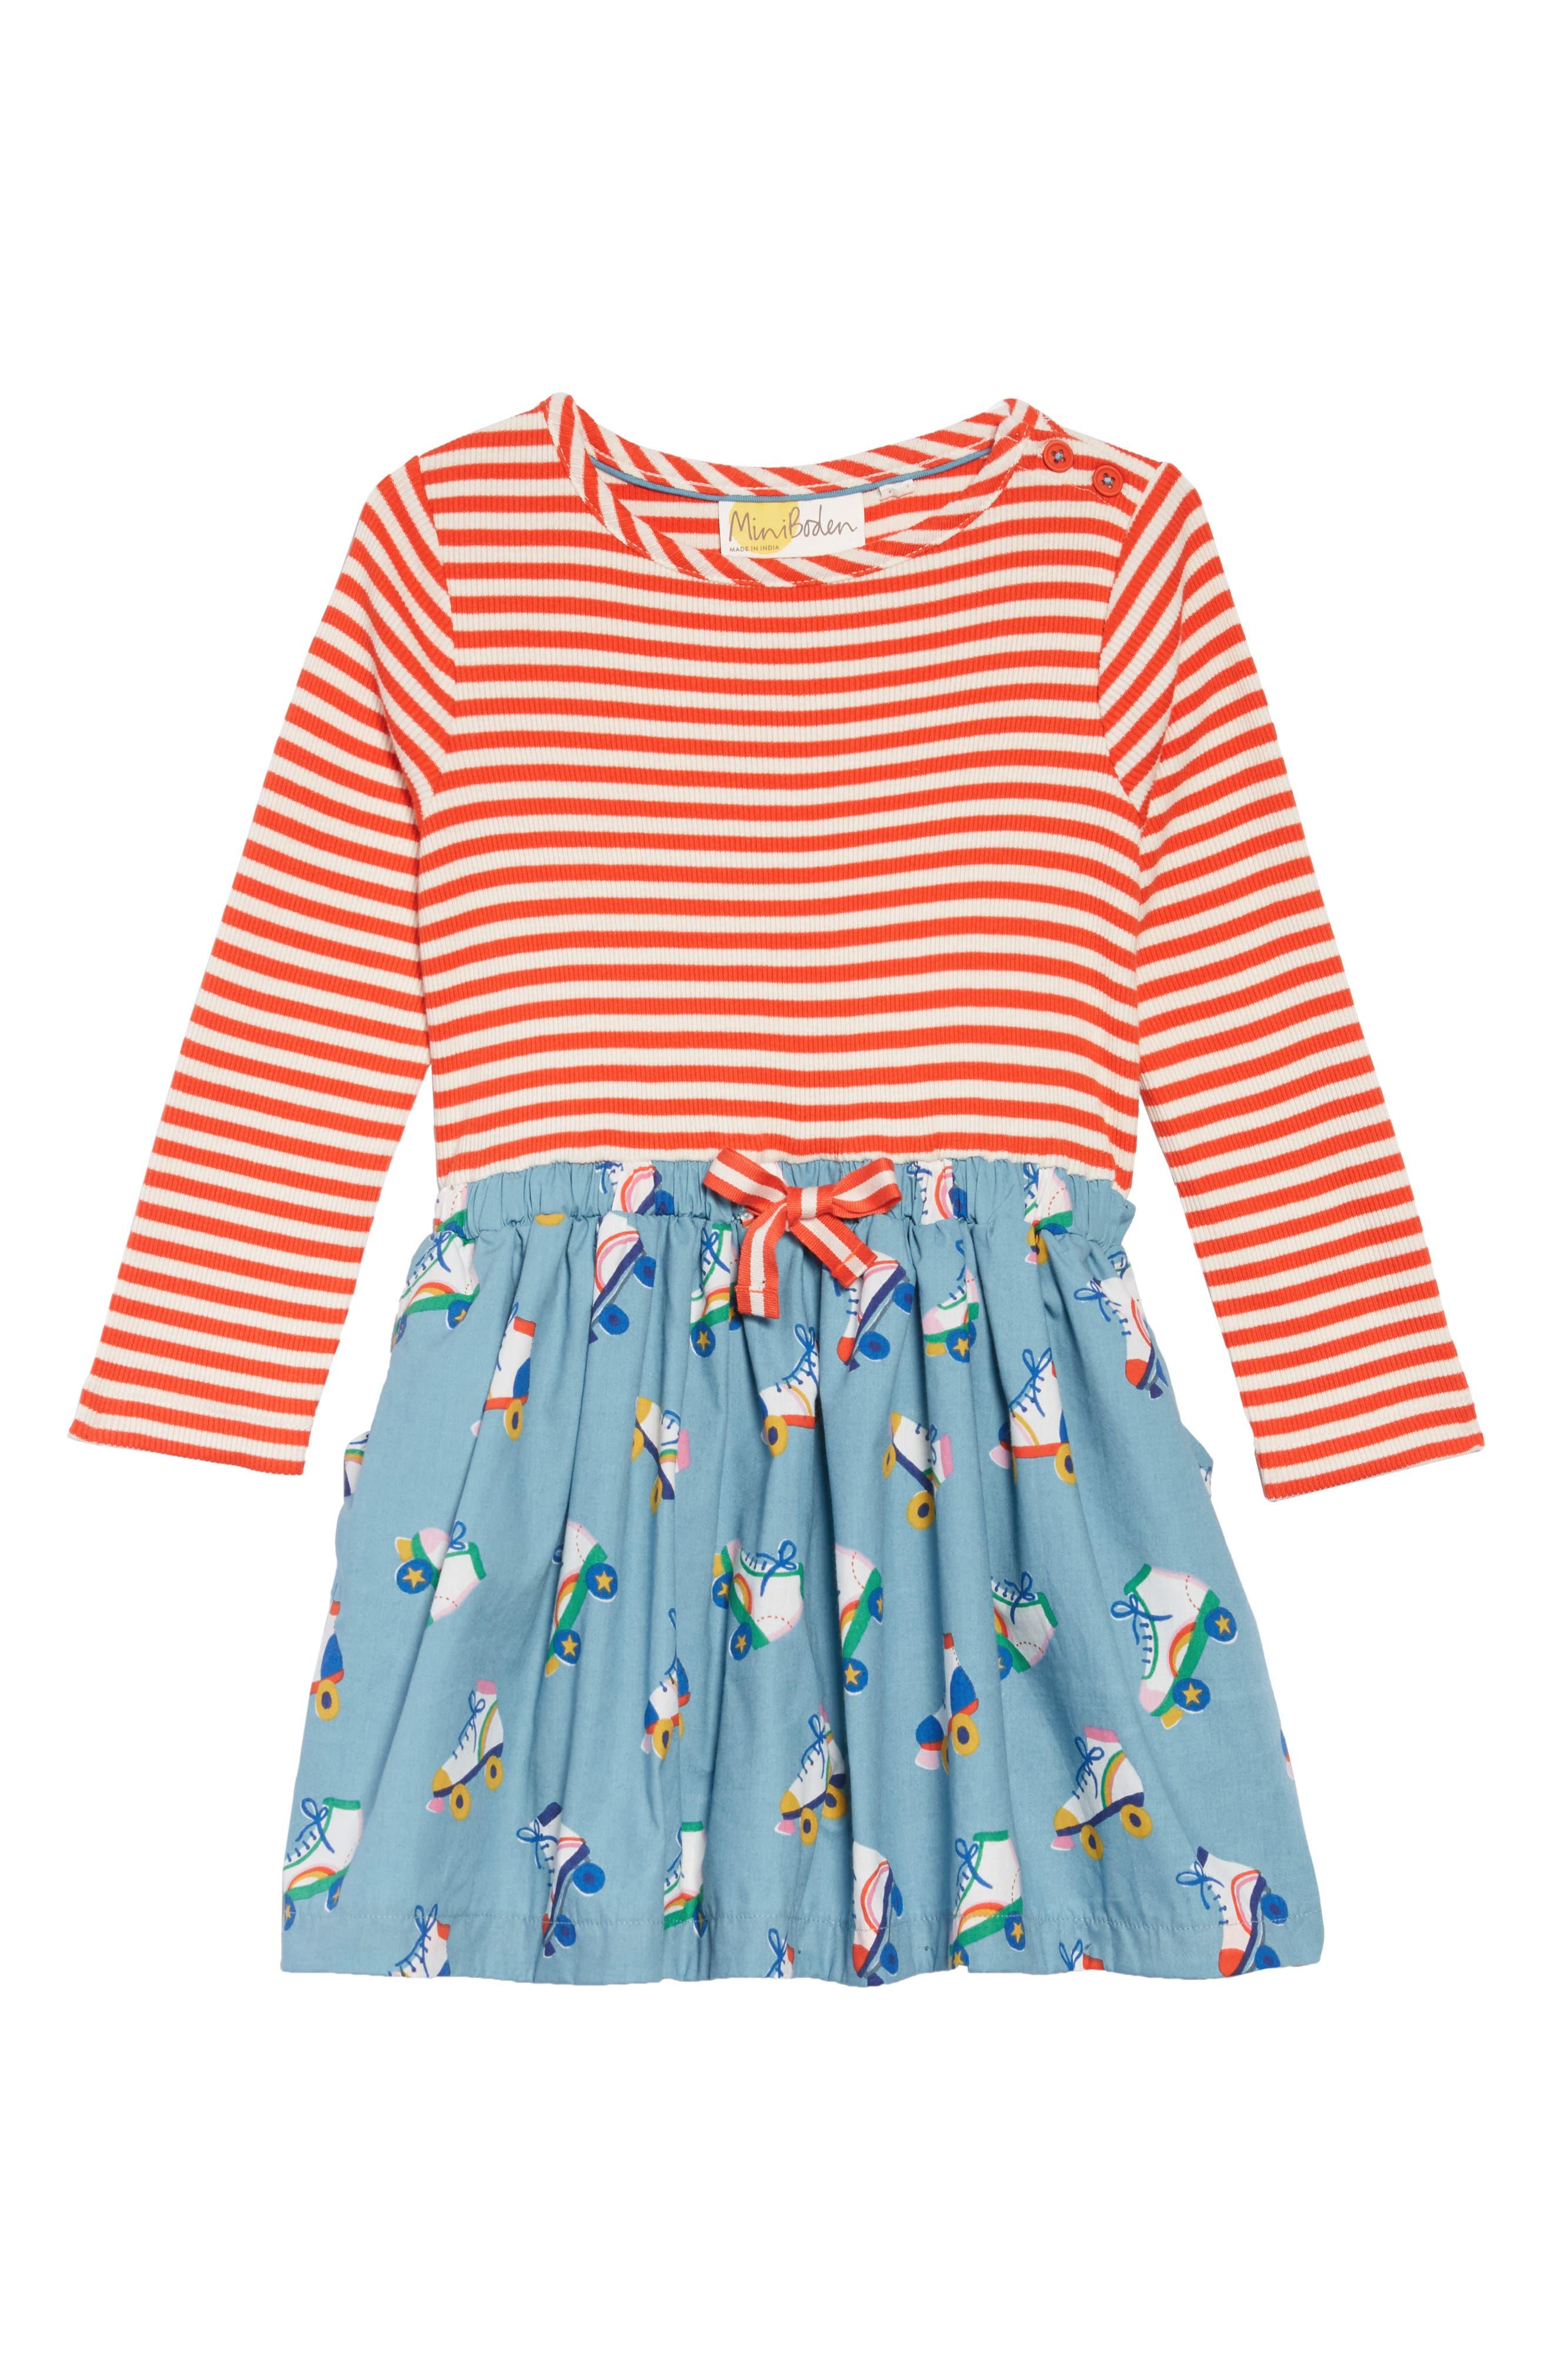 Hopscotch Dress,                         Main,                         color, BLUE ROLLER SKATES